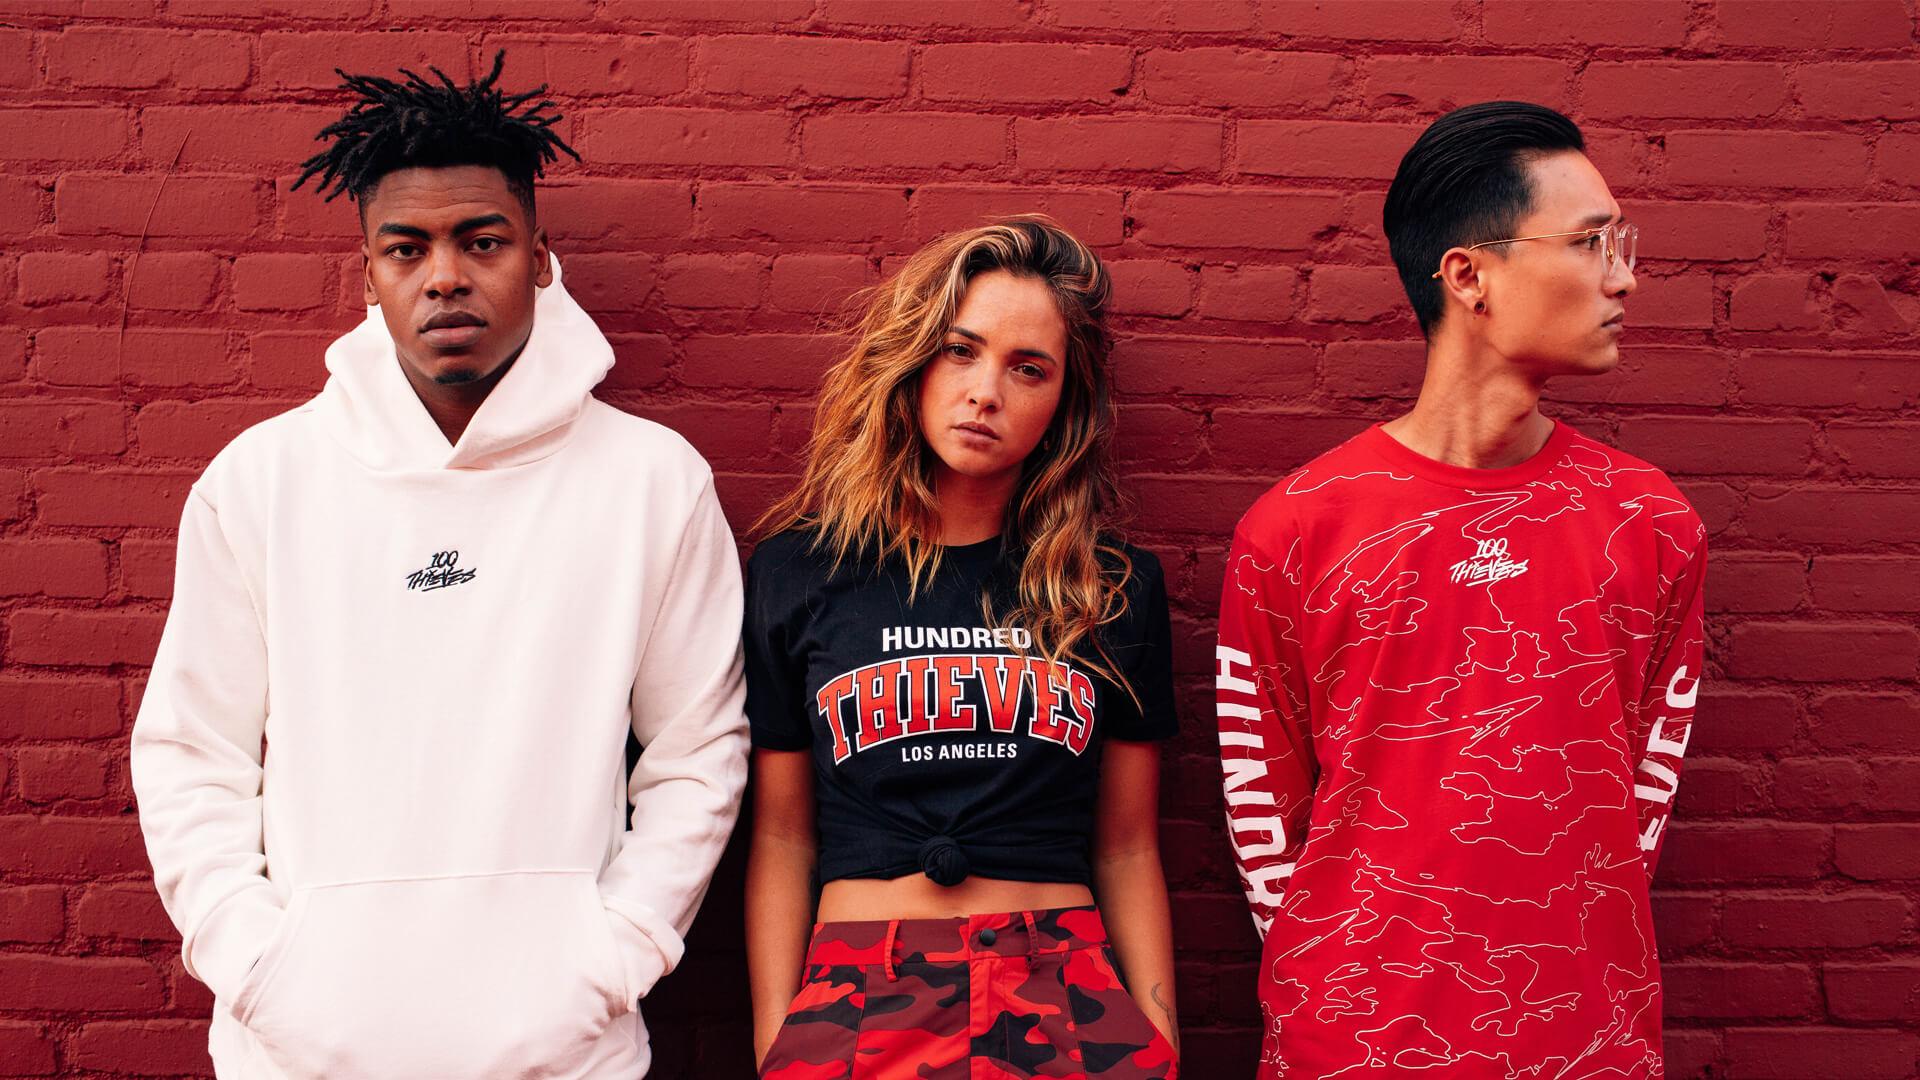 3 models in streetwear pose over brick wall